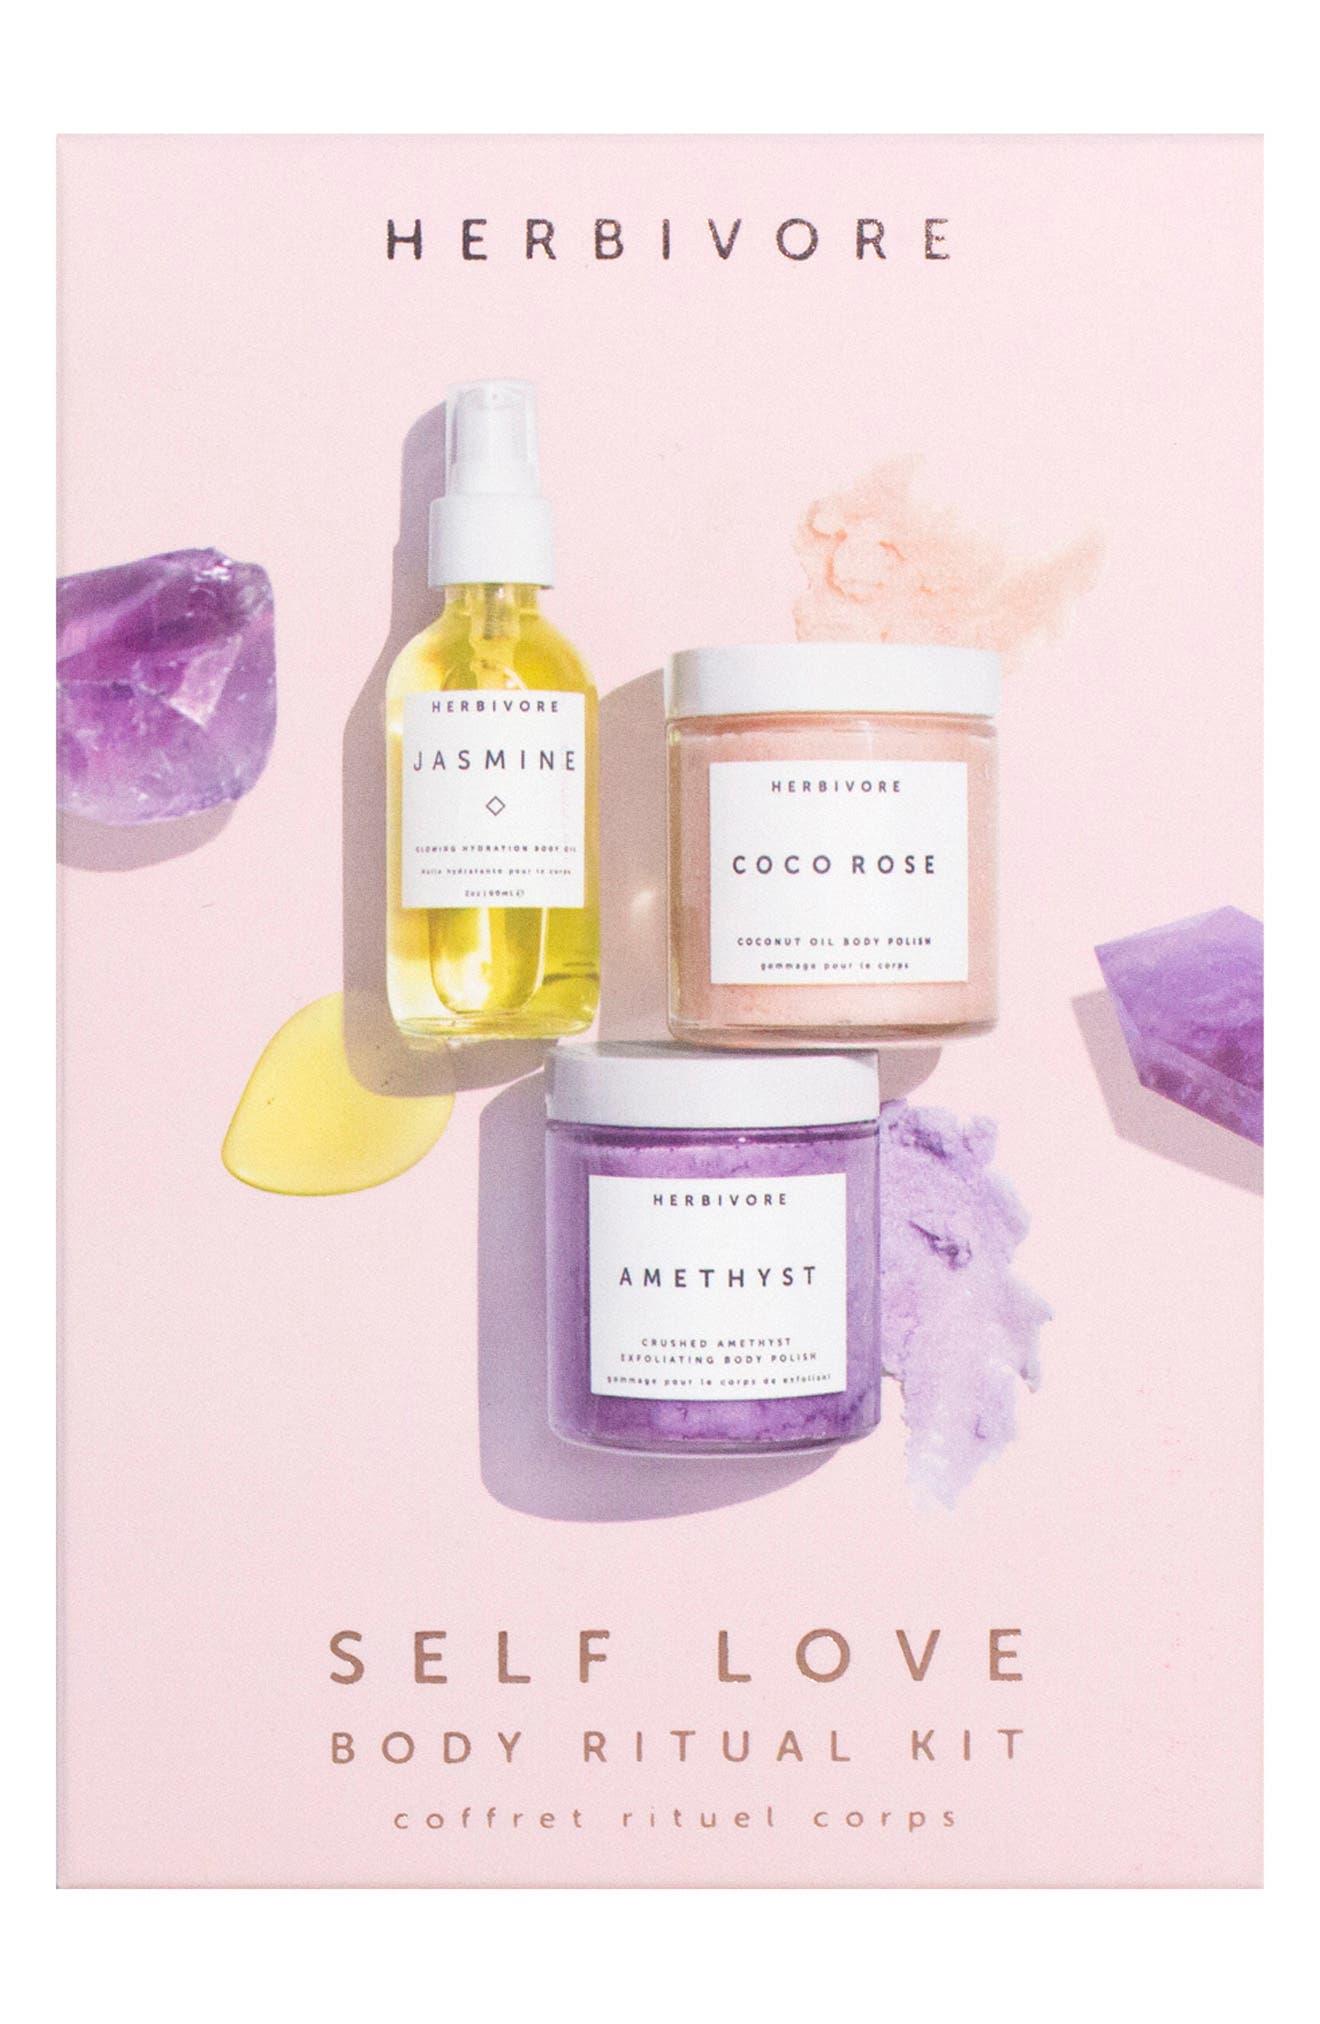 Self Love Body Ritual Kit by Herbivore Botanicals